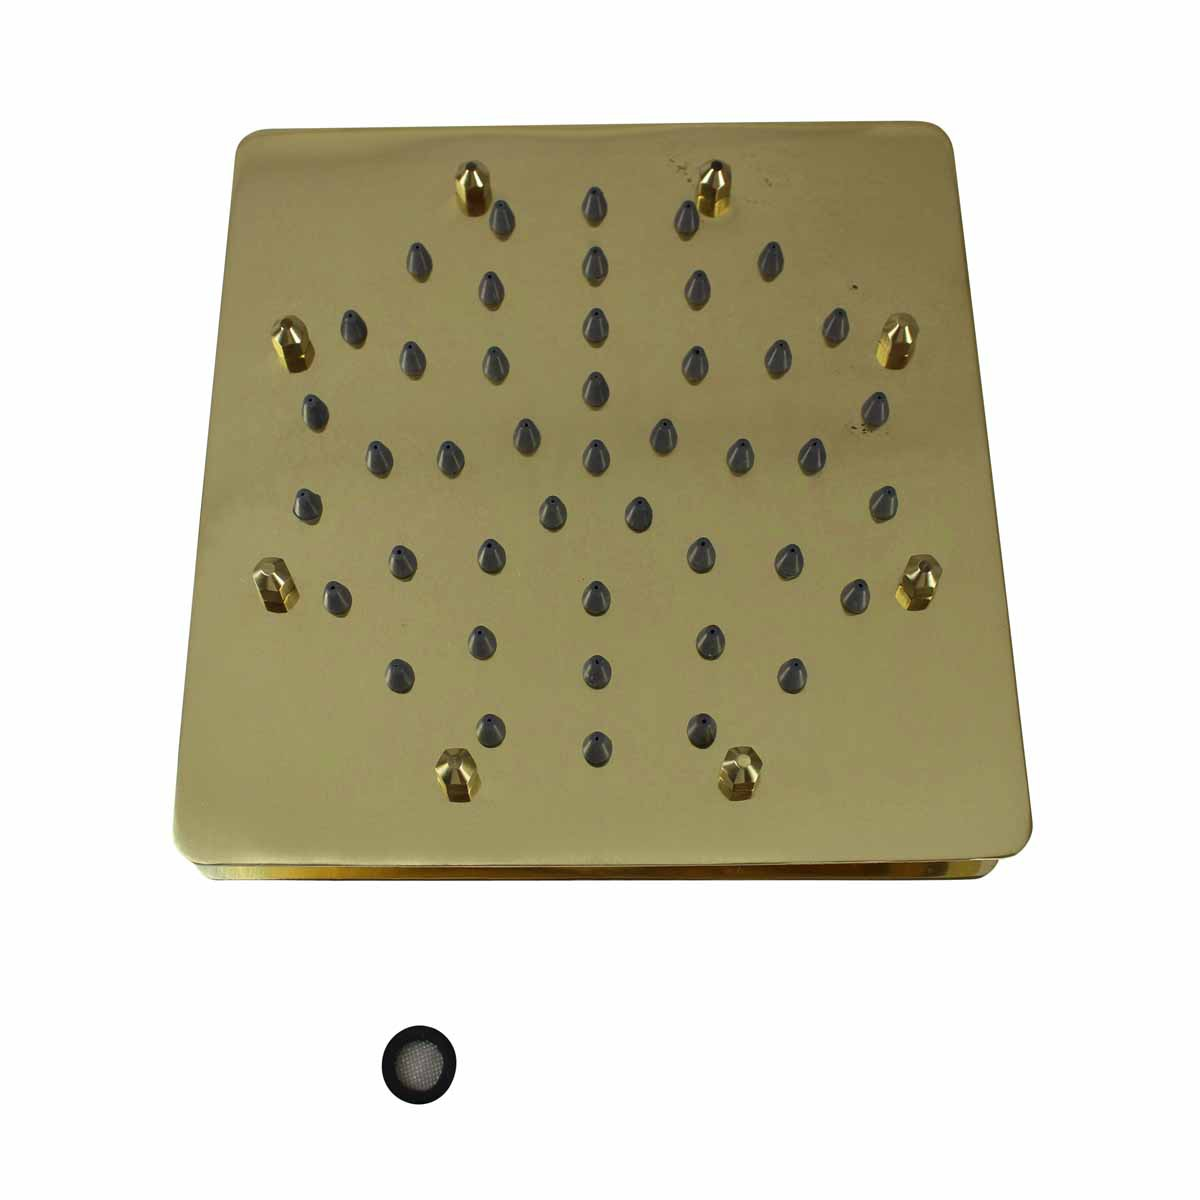 Shower Head Gold PVD 51 Fine Mist Jets Single Hole Shower Head Shower Heads Bath Shower Head